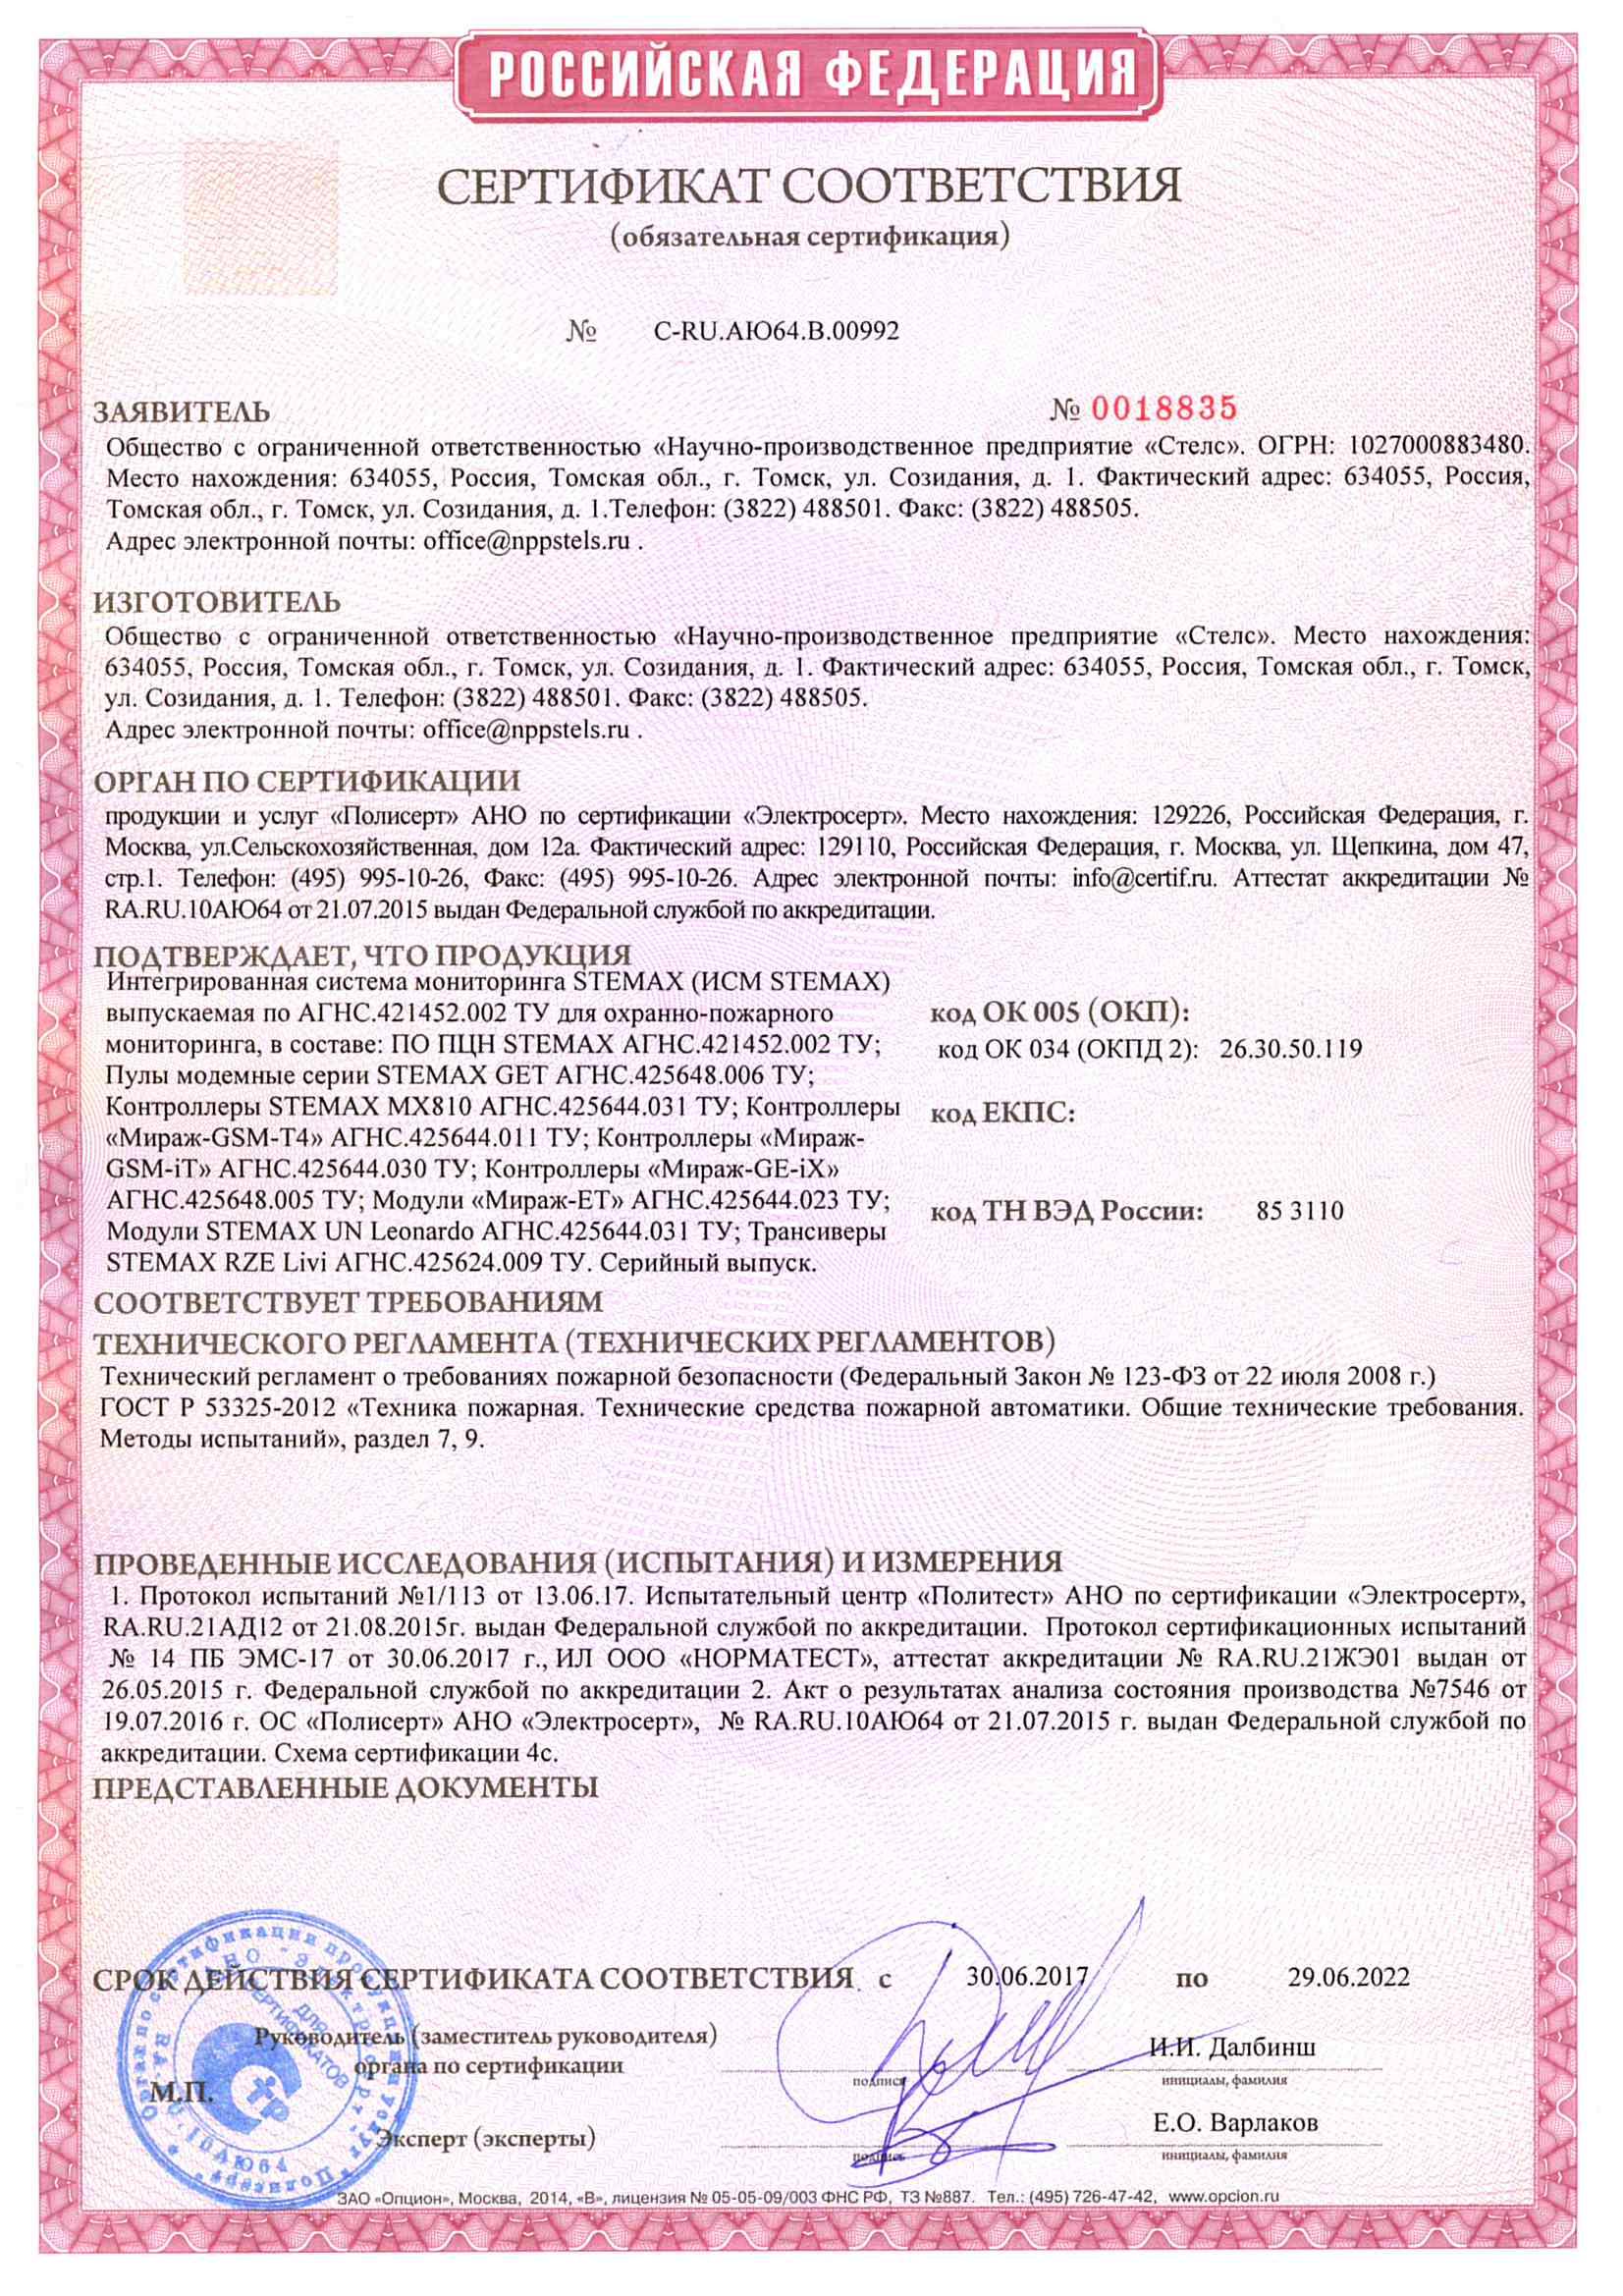 STEMAX сертификат соответствия.jpg